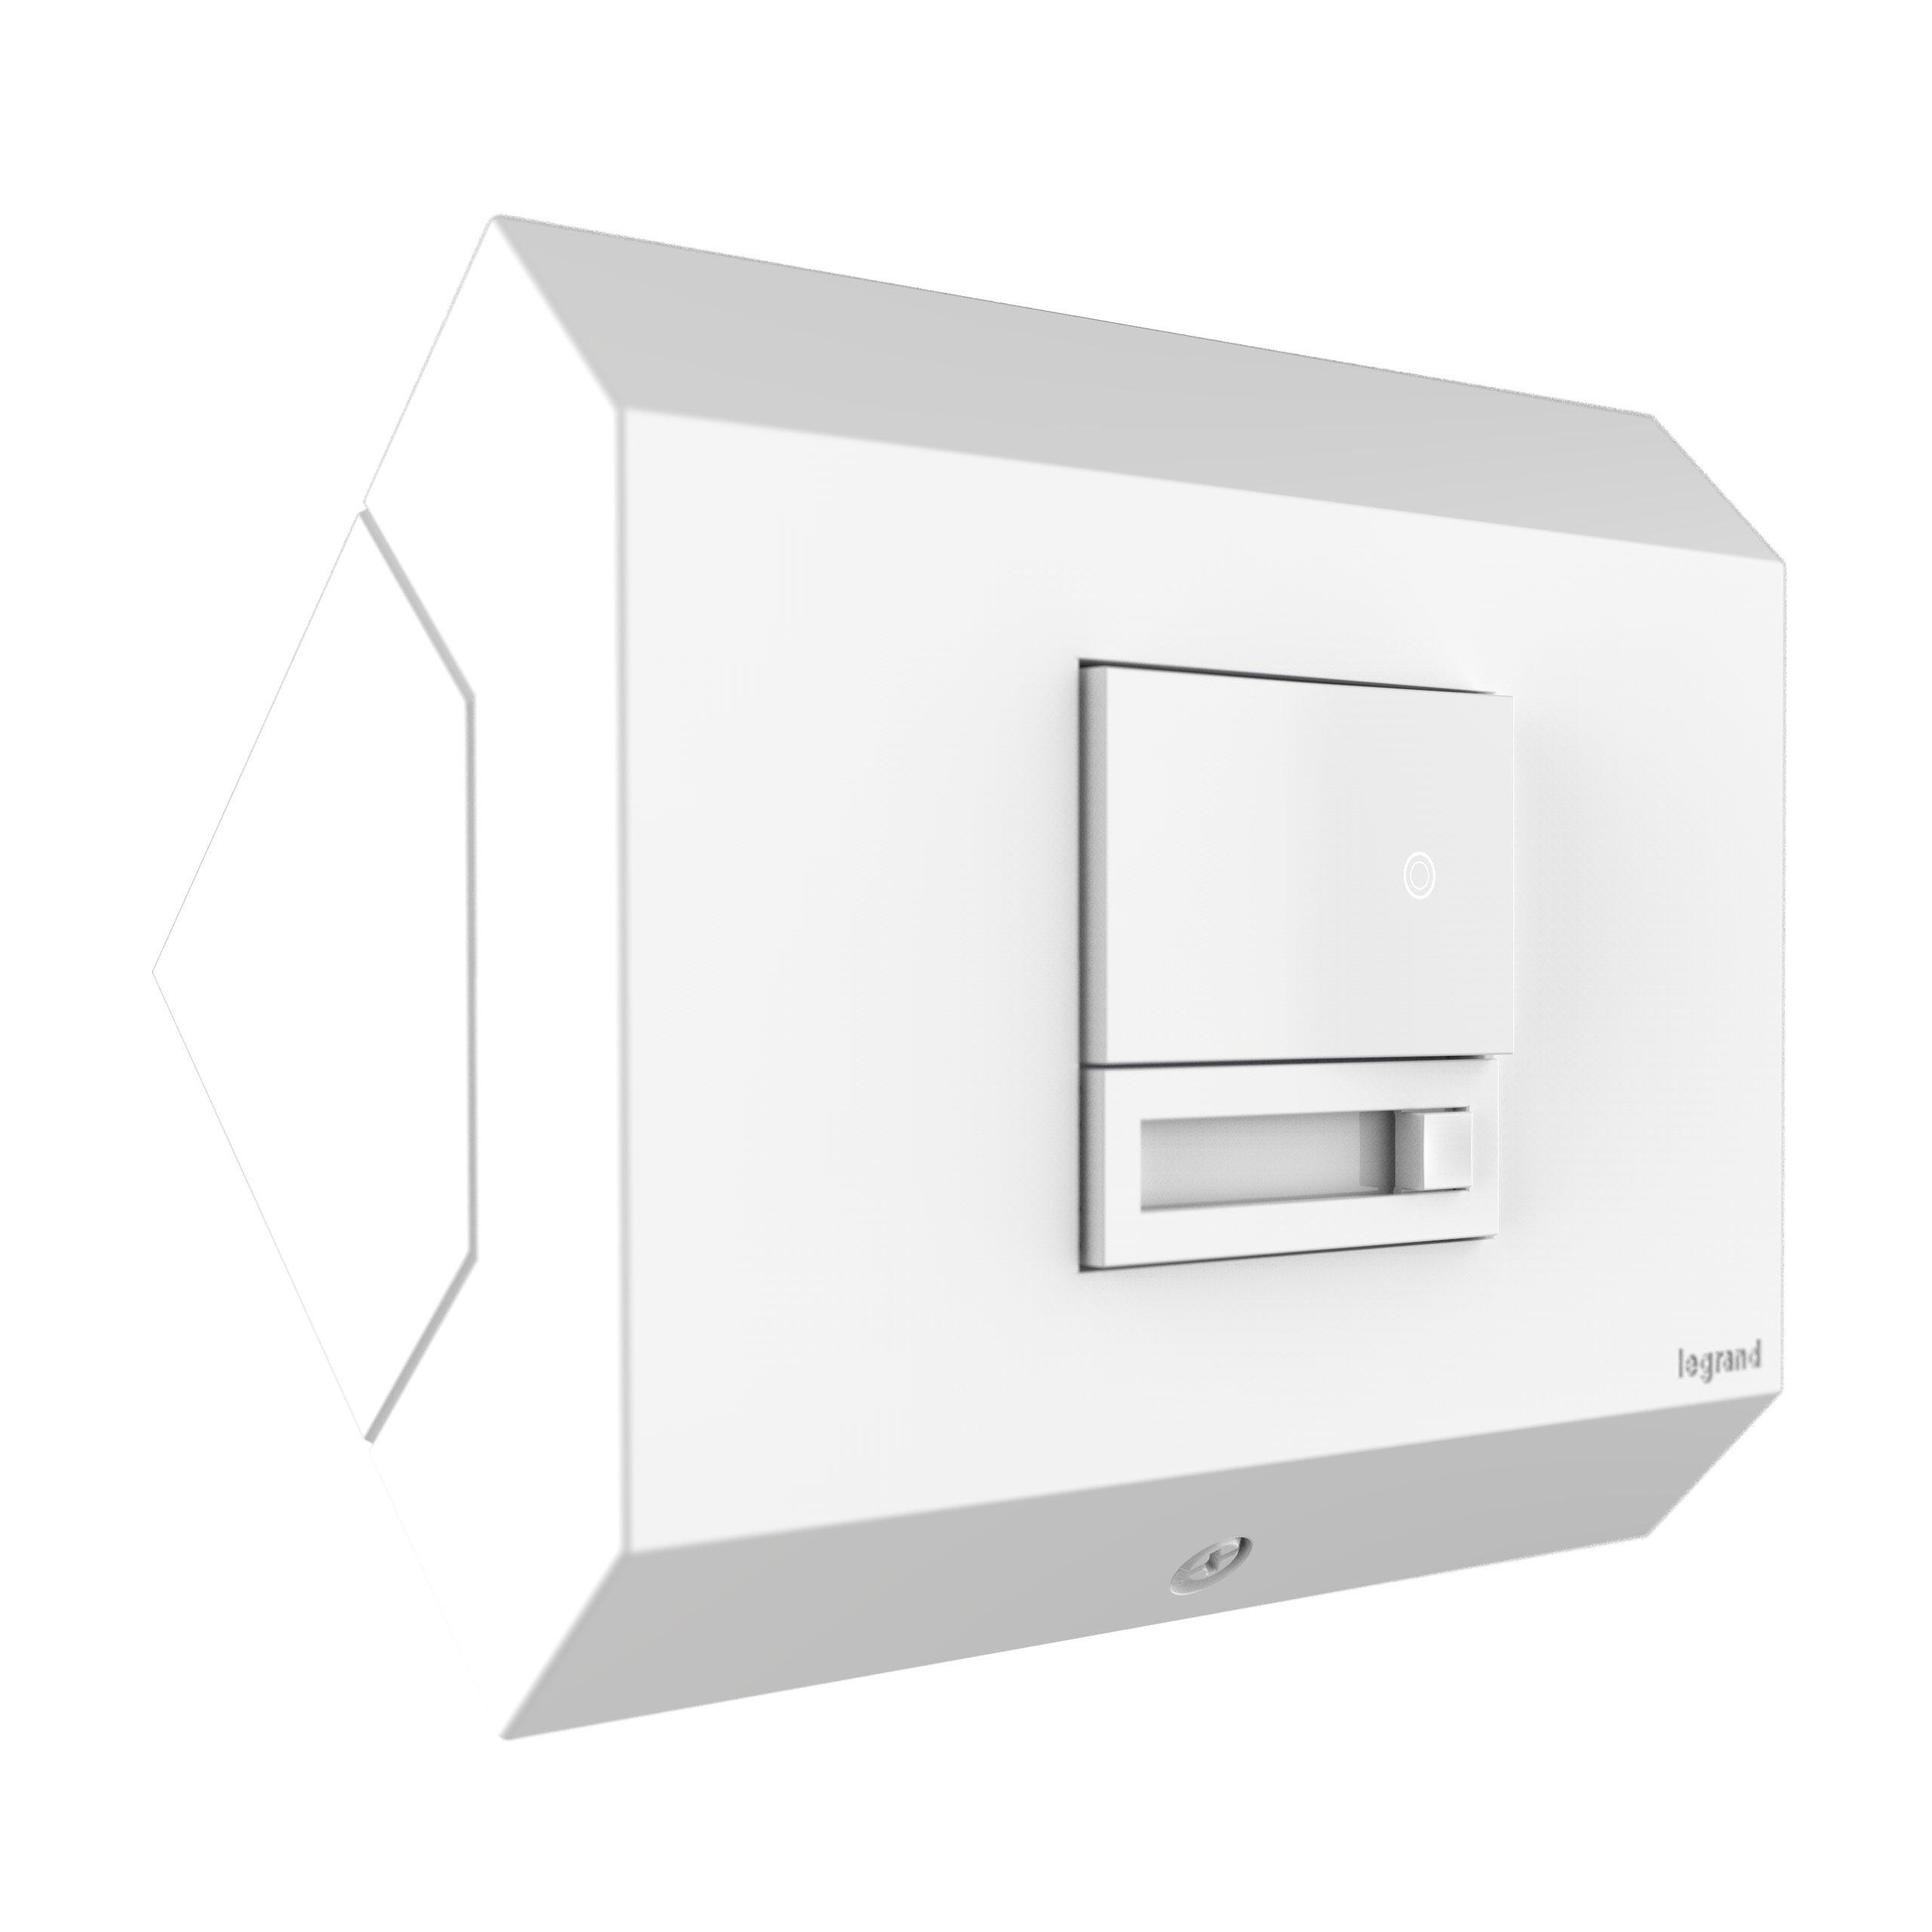 LGR APCB1W4 ADORNE CONTROL BOX 1 W/DIMMER WHITE